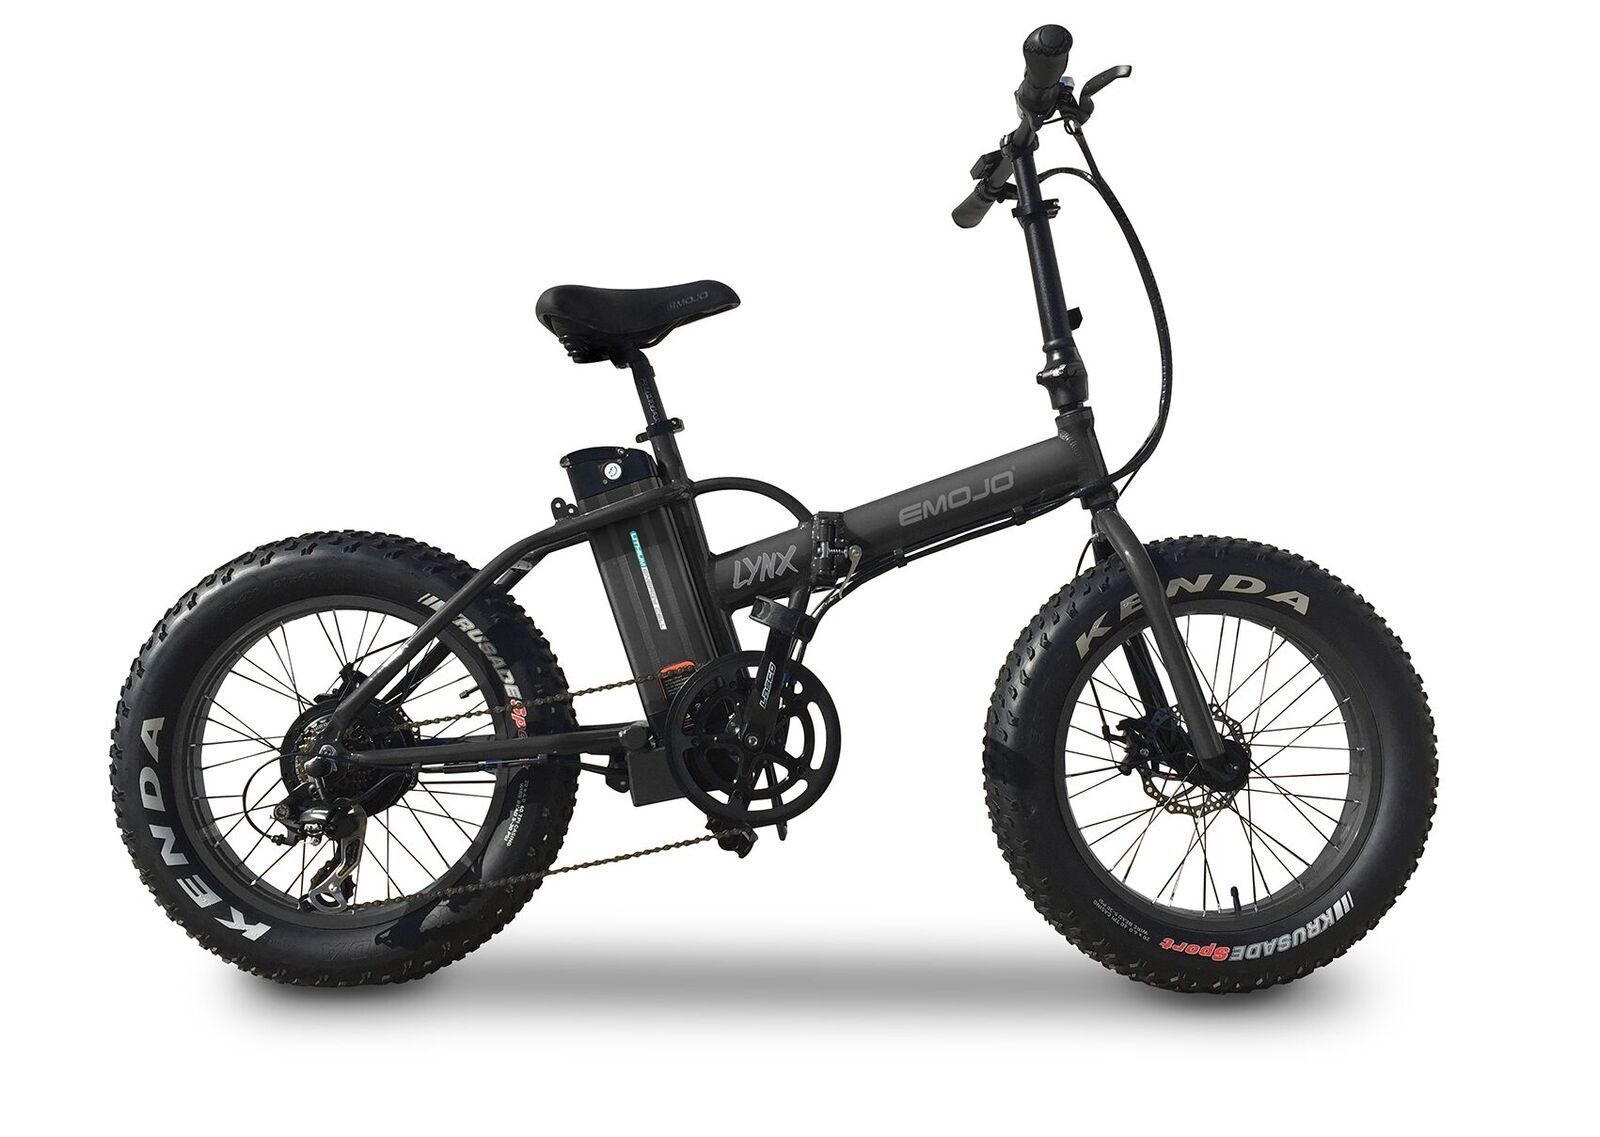 Emojo Lynx 500 Watt 36 Volt Folding Electric Bike Folding